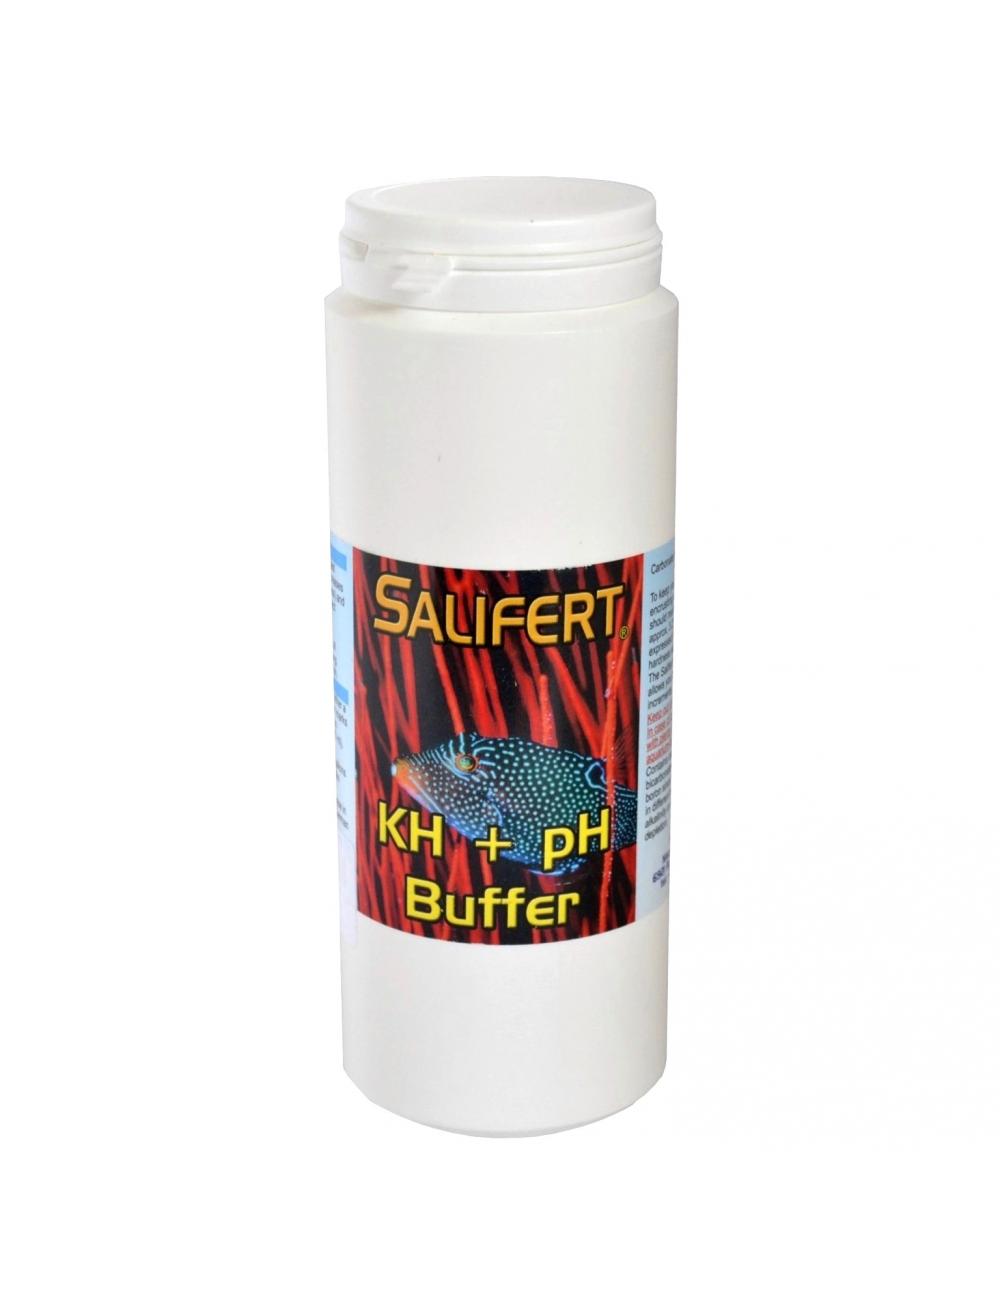 SALIFERT - Kh + Ph buffer 500 ml